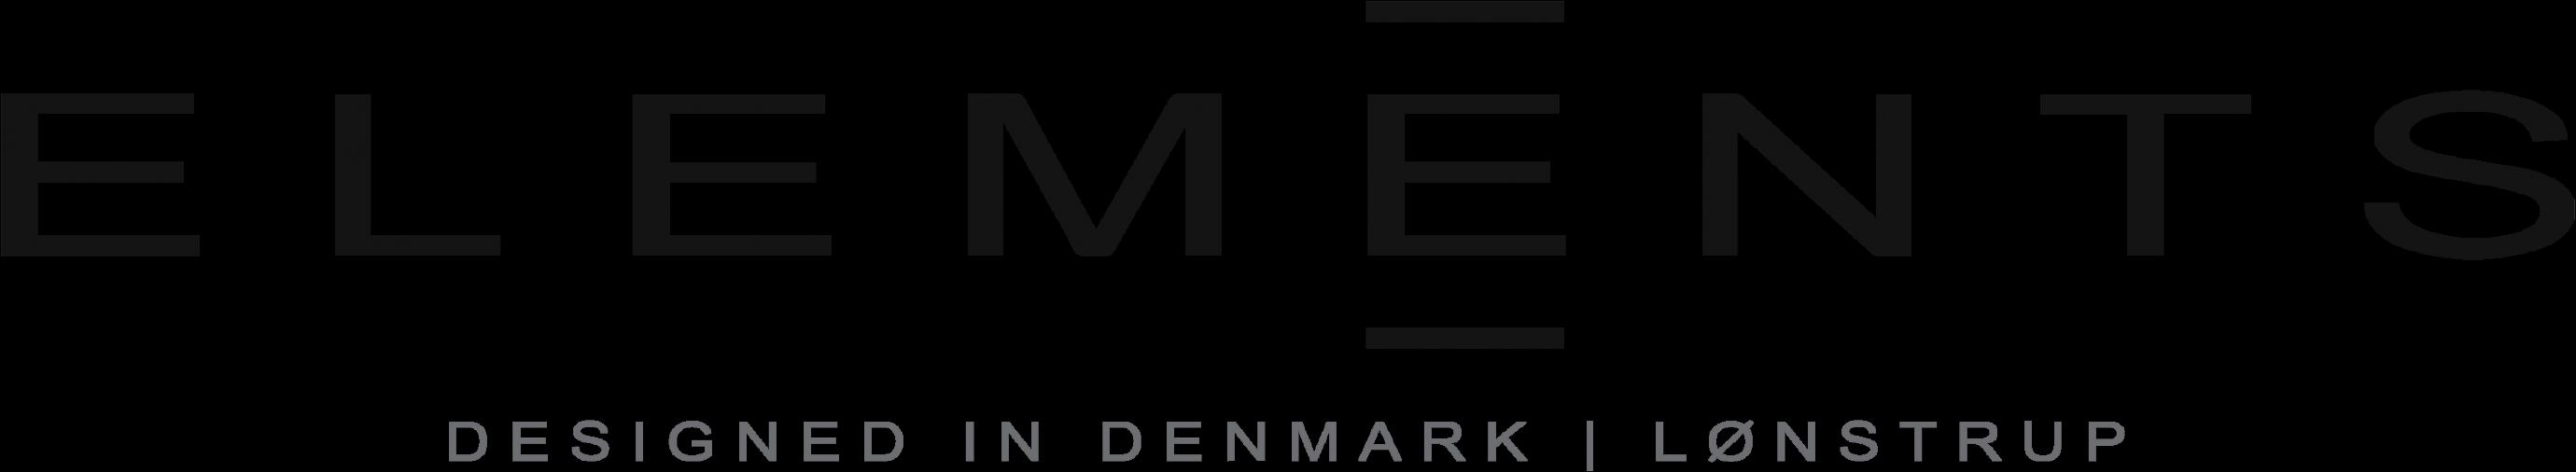 Logo-Nordic-Elements.png